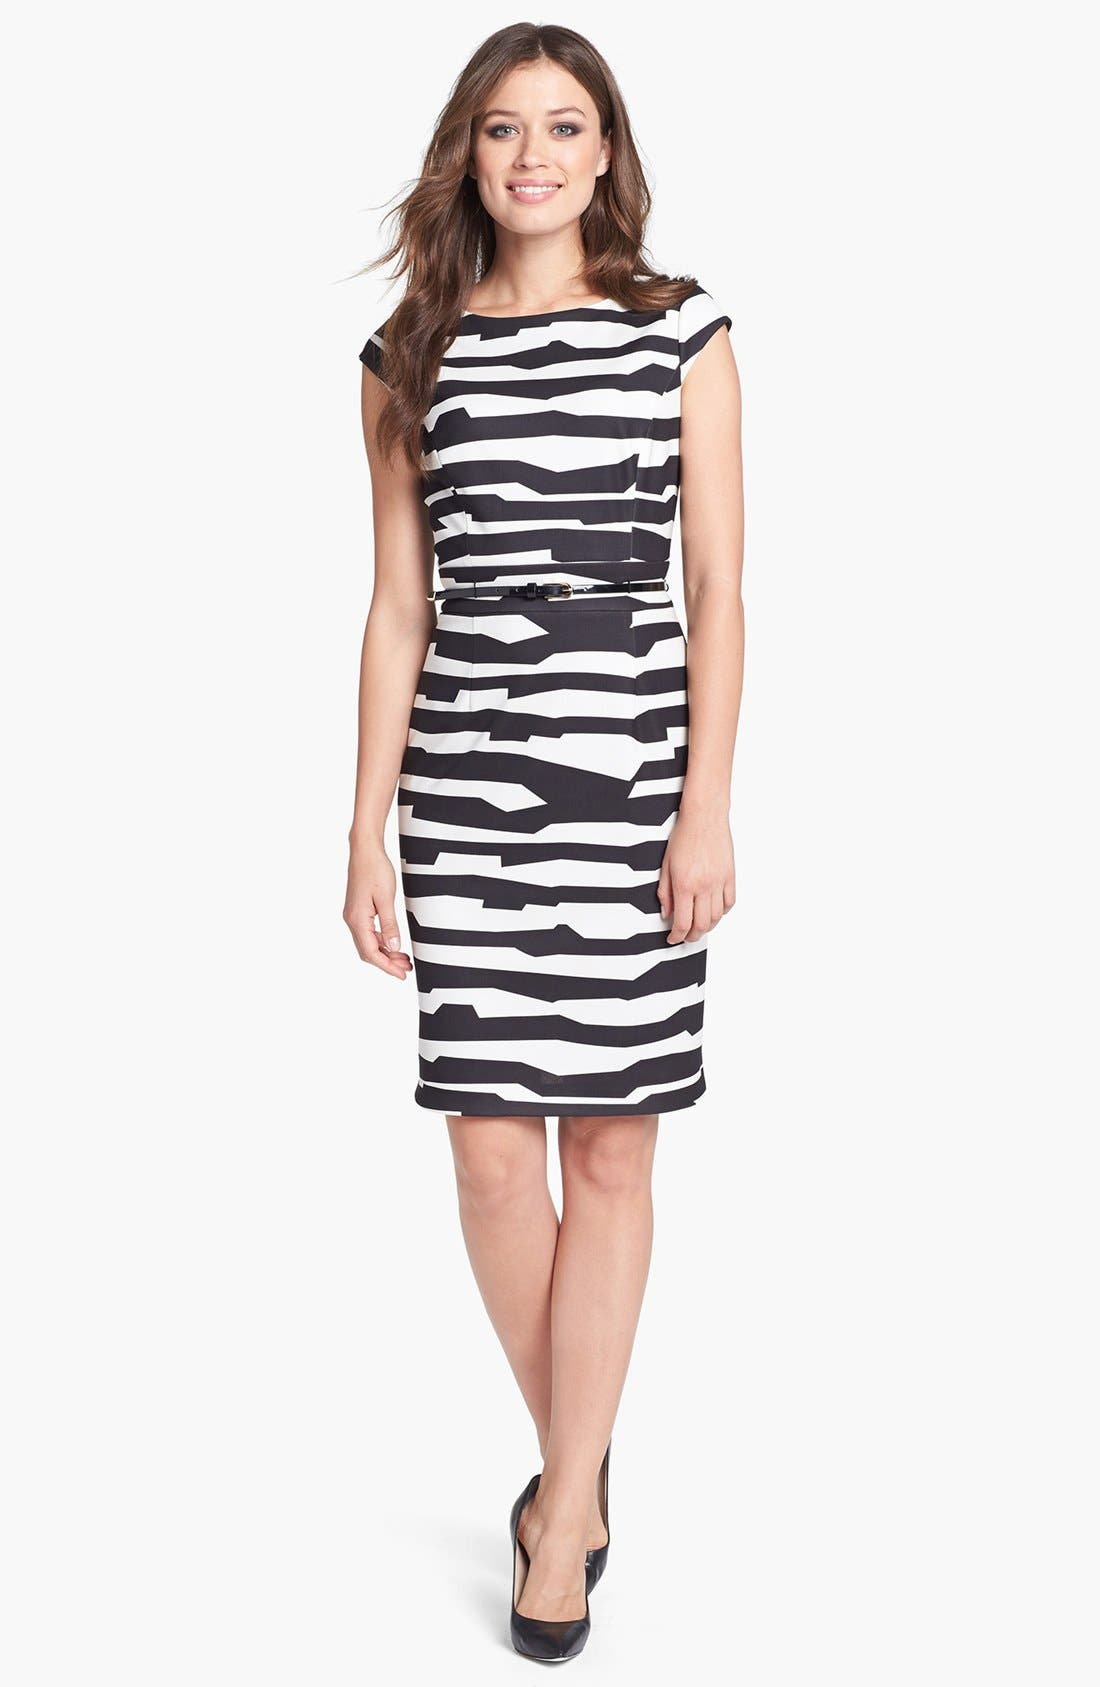 Alternate Image 1 Selected - Tahari Belted Print Scuba Sheath Dress (Petite)